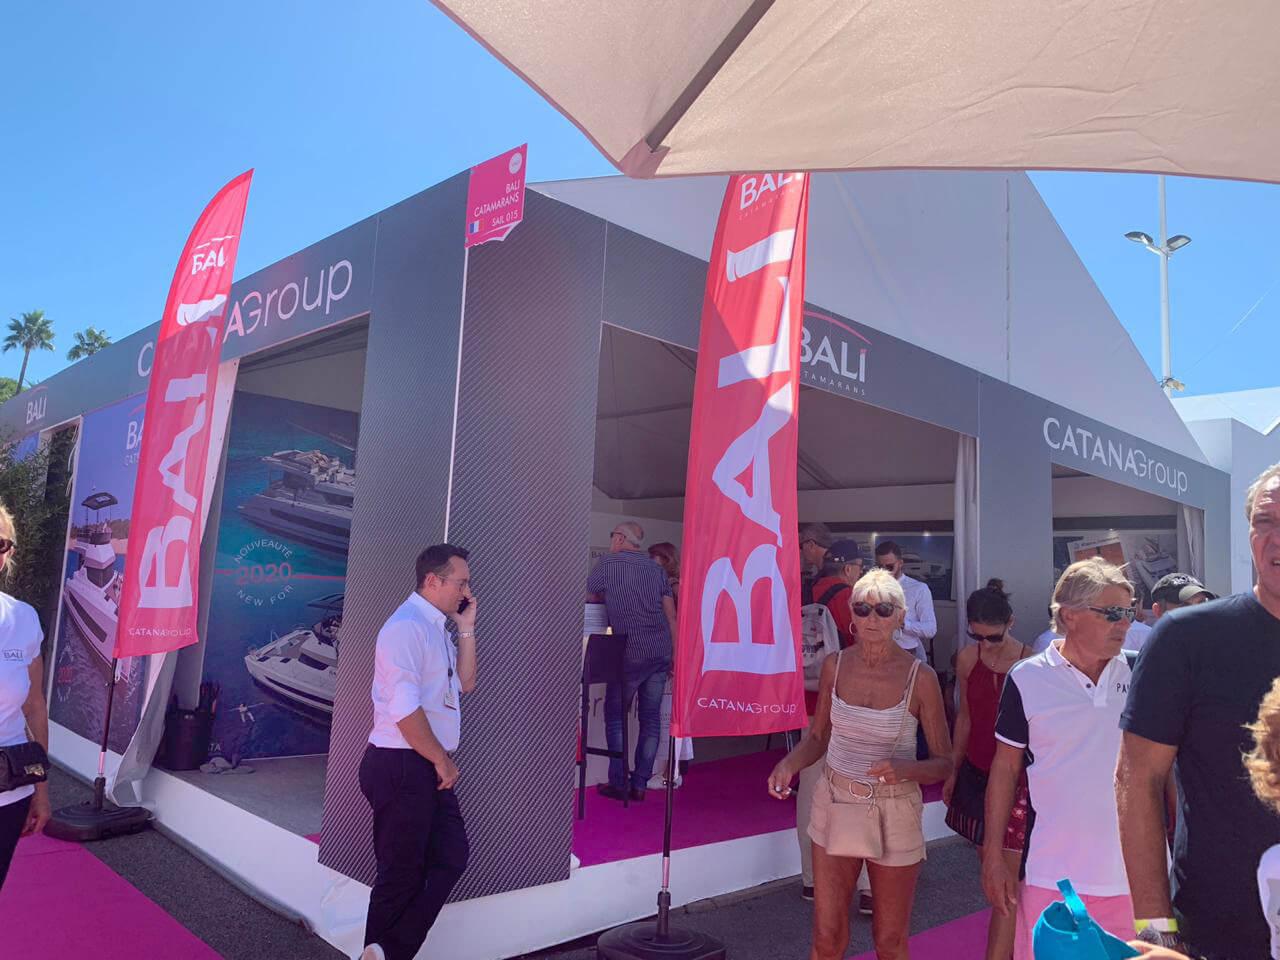 BALI vuelve a Cannes